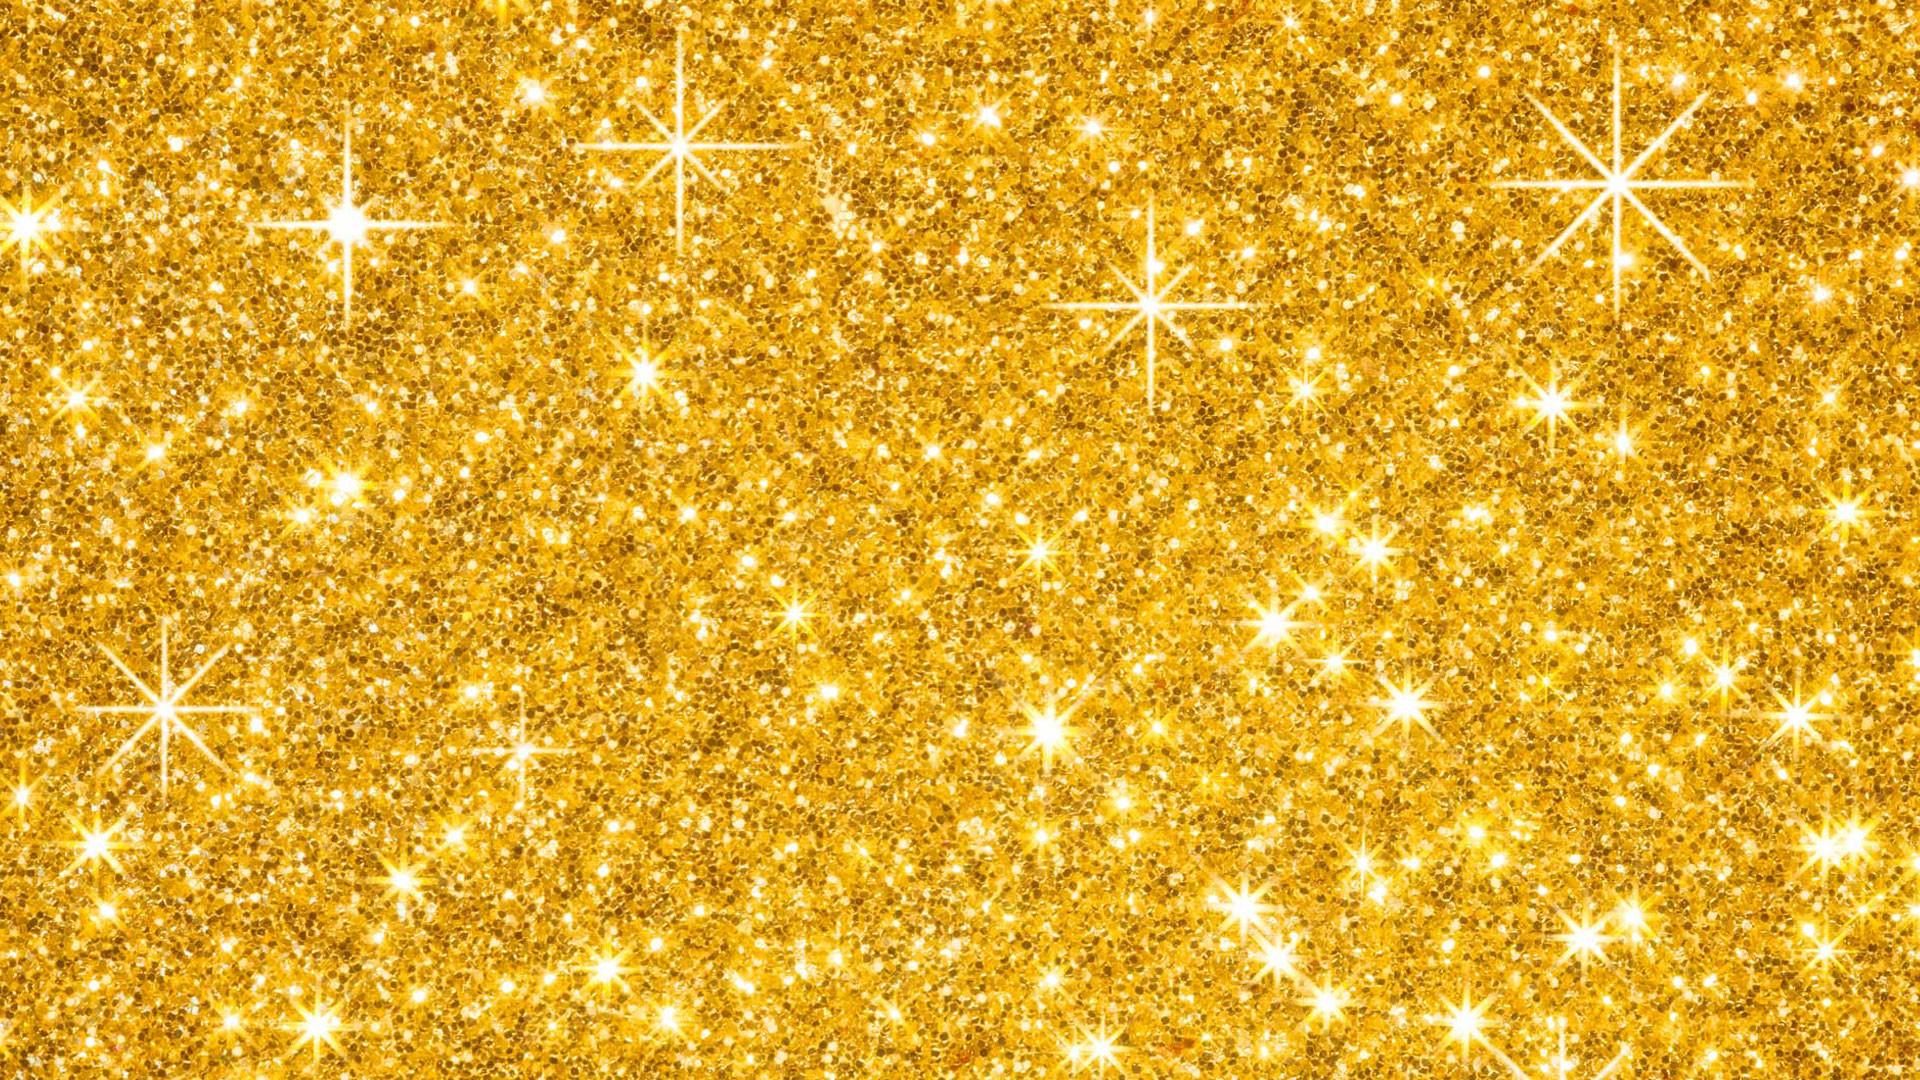 Gold Glitter Wallpaper HD For Desktop.